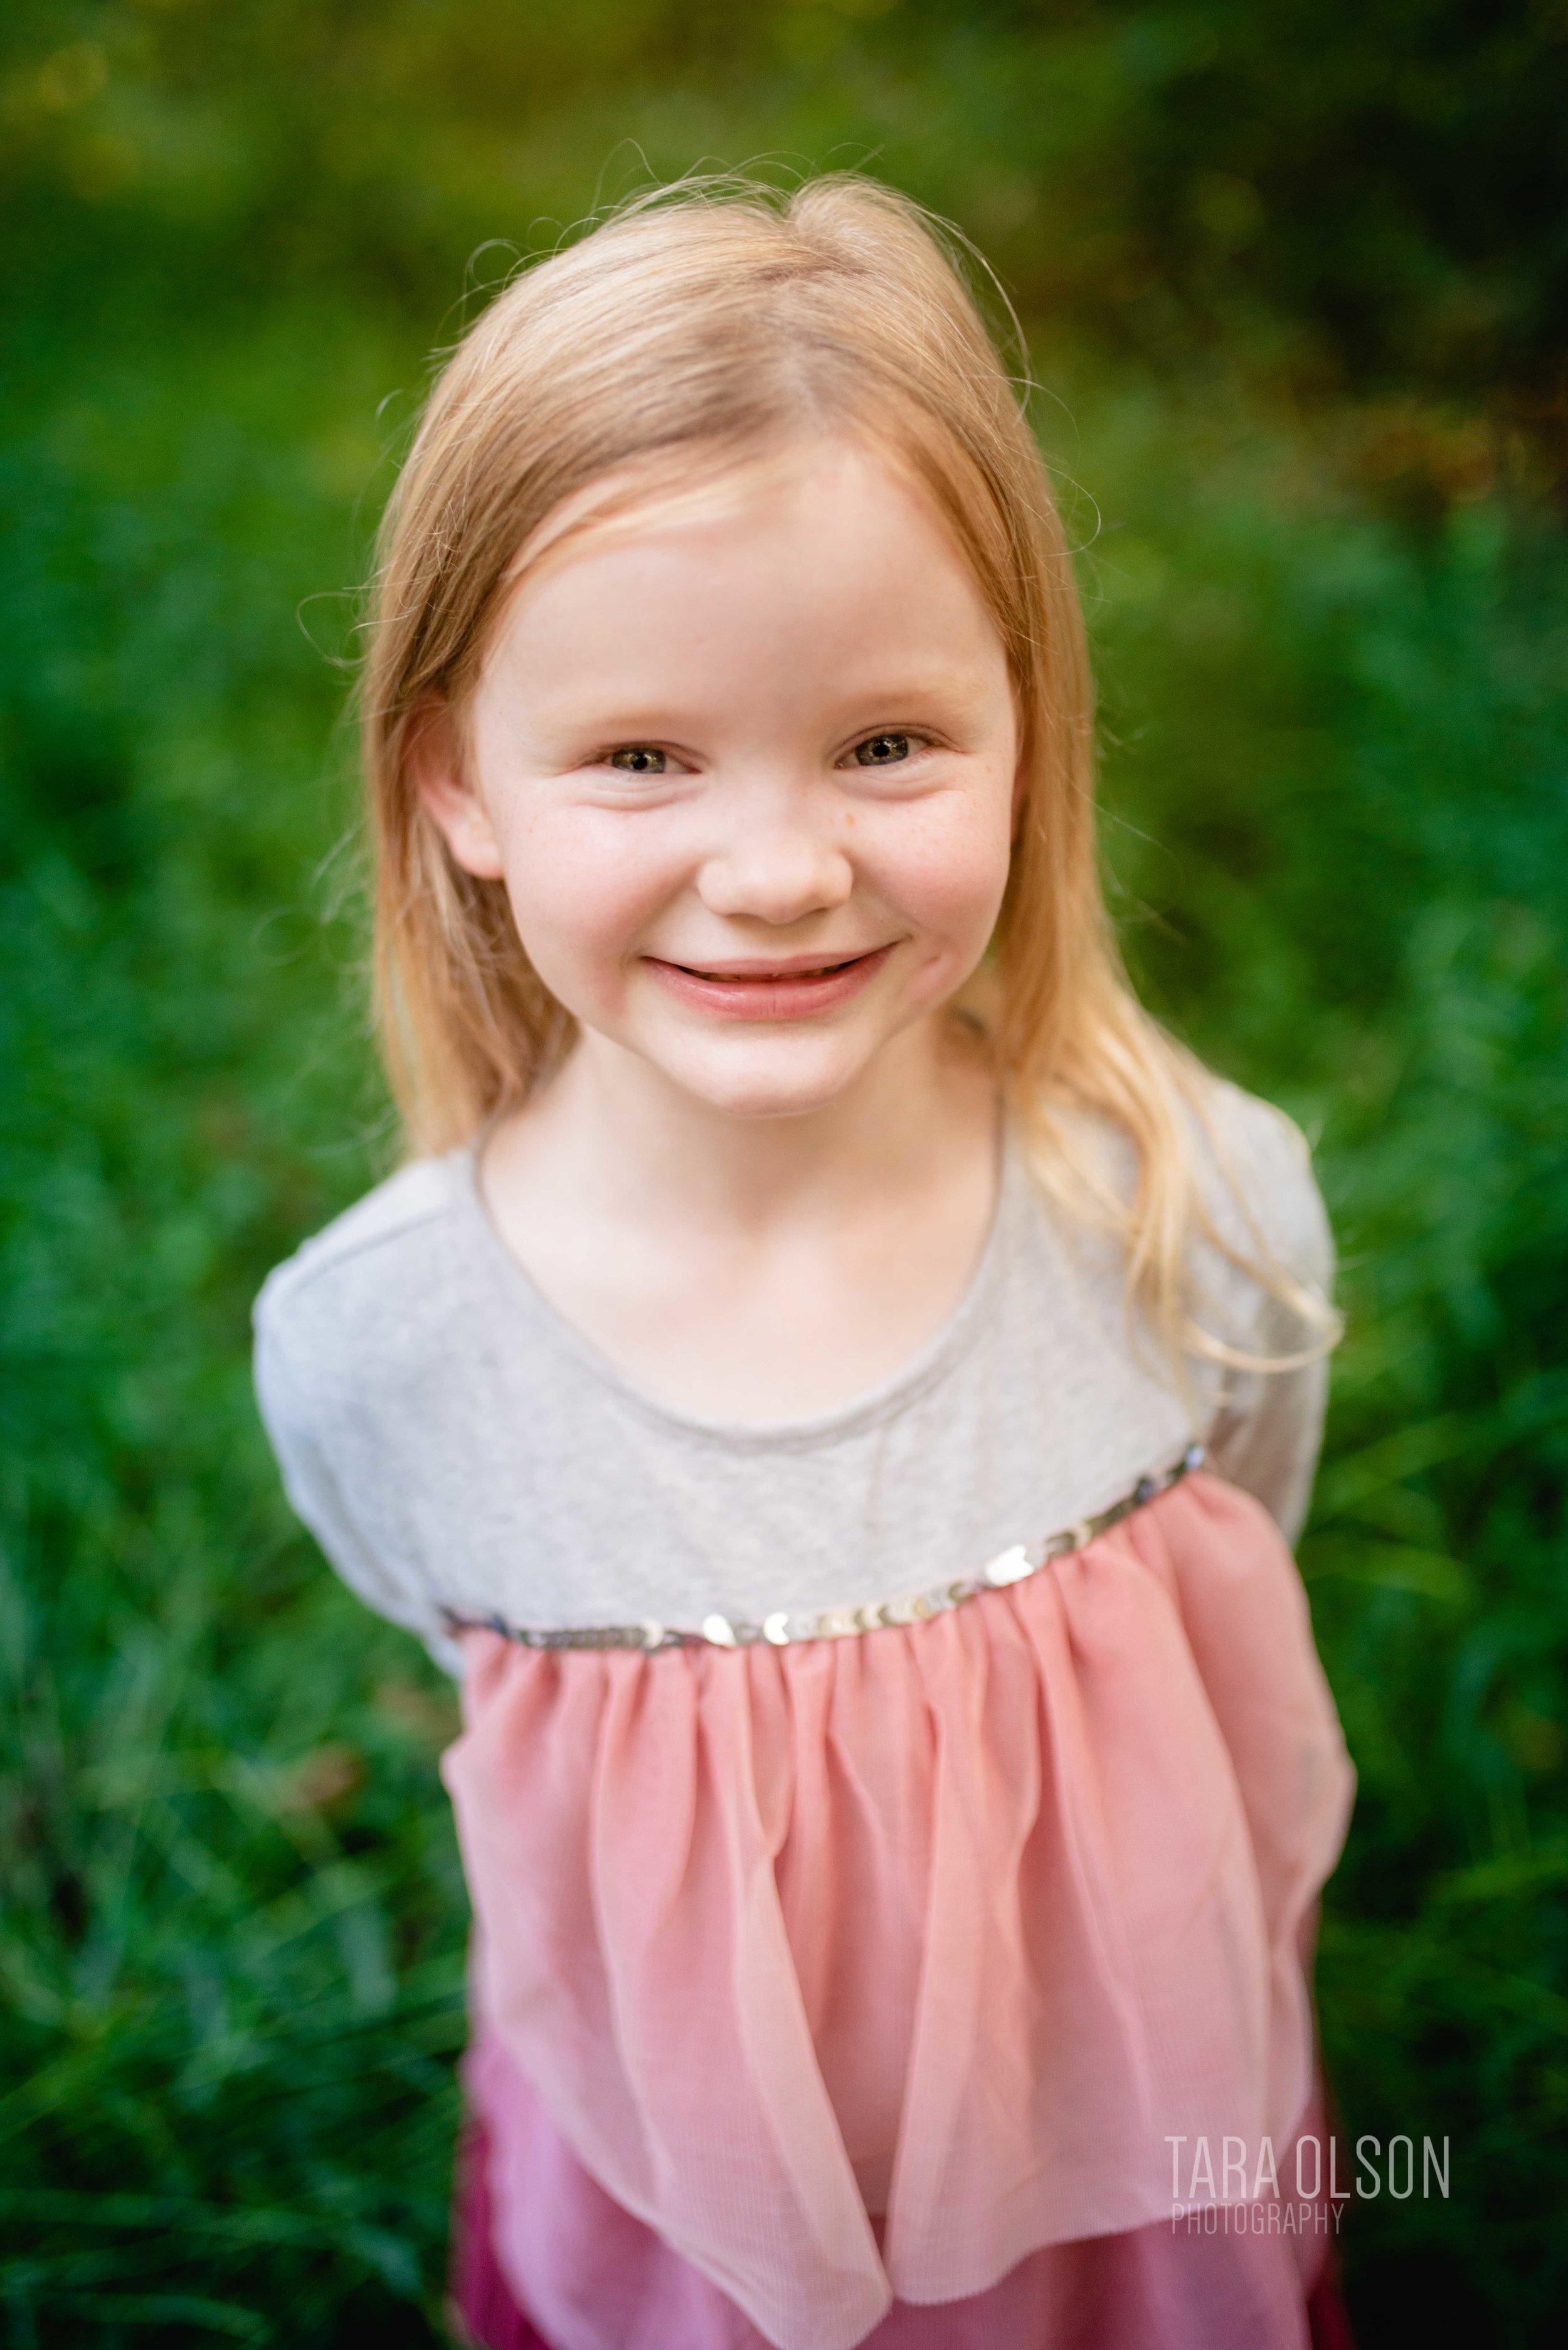 Hawkins_Arlington-Virginia-Family-Photographer_Tara-Olson-Photography_4238.jpg